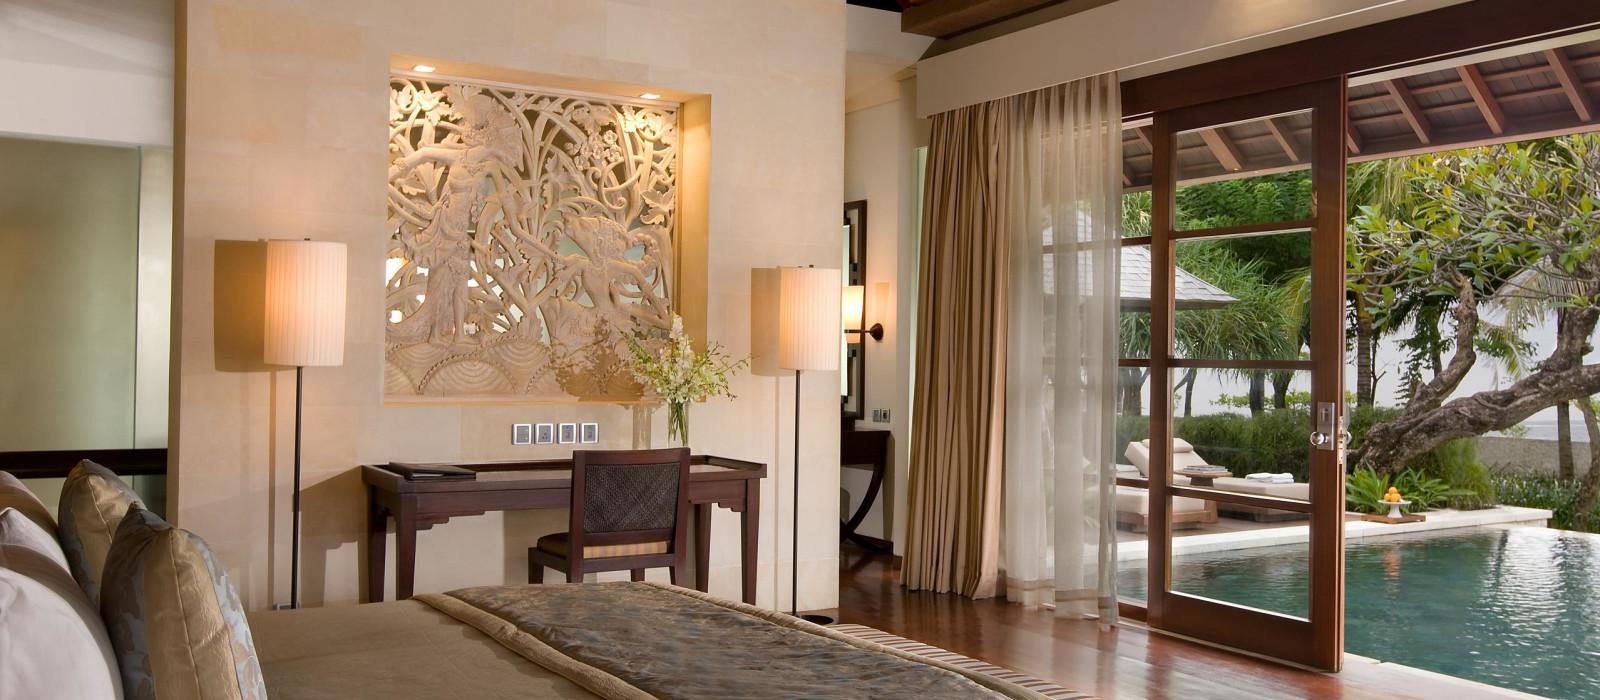 Hotel The Royal Santrian Luxury Beach Villas Indonesien